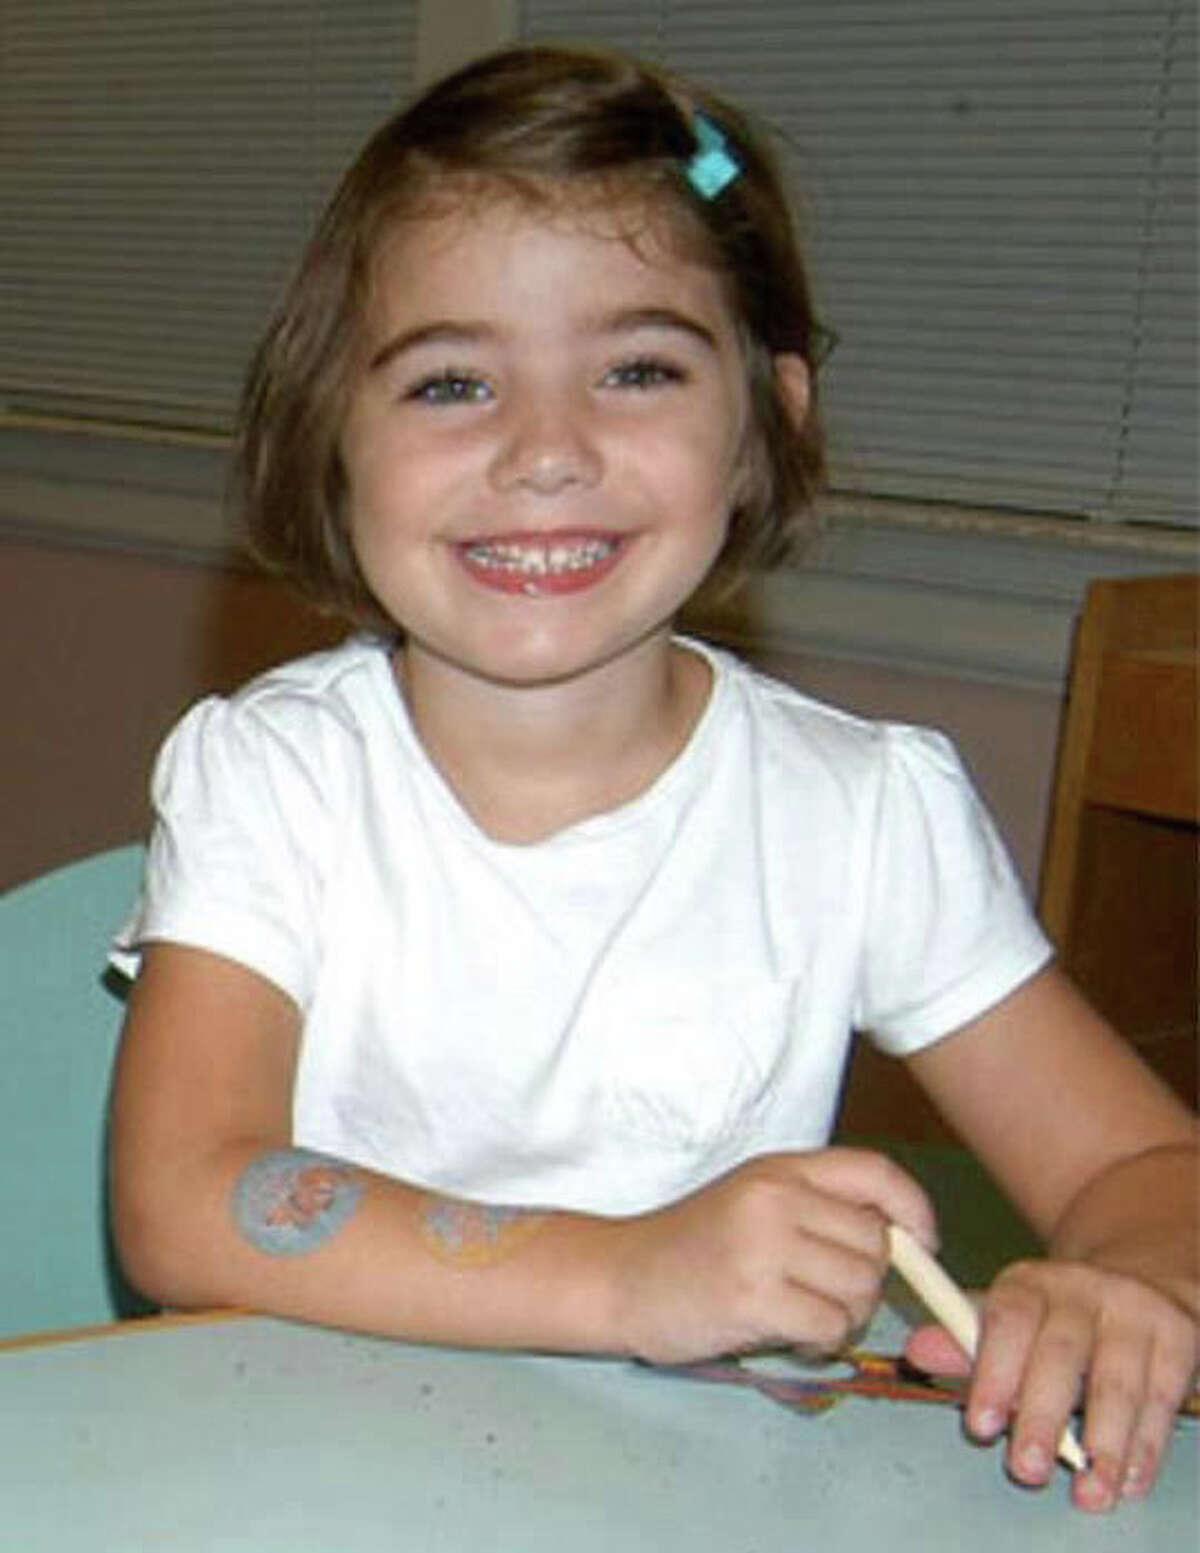 Caroline Previdi died in the Sandy Hook Elementary School shooting in Newtown, Conn. on Friday, Dec. 14, 2012.